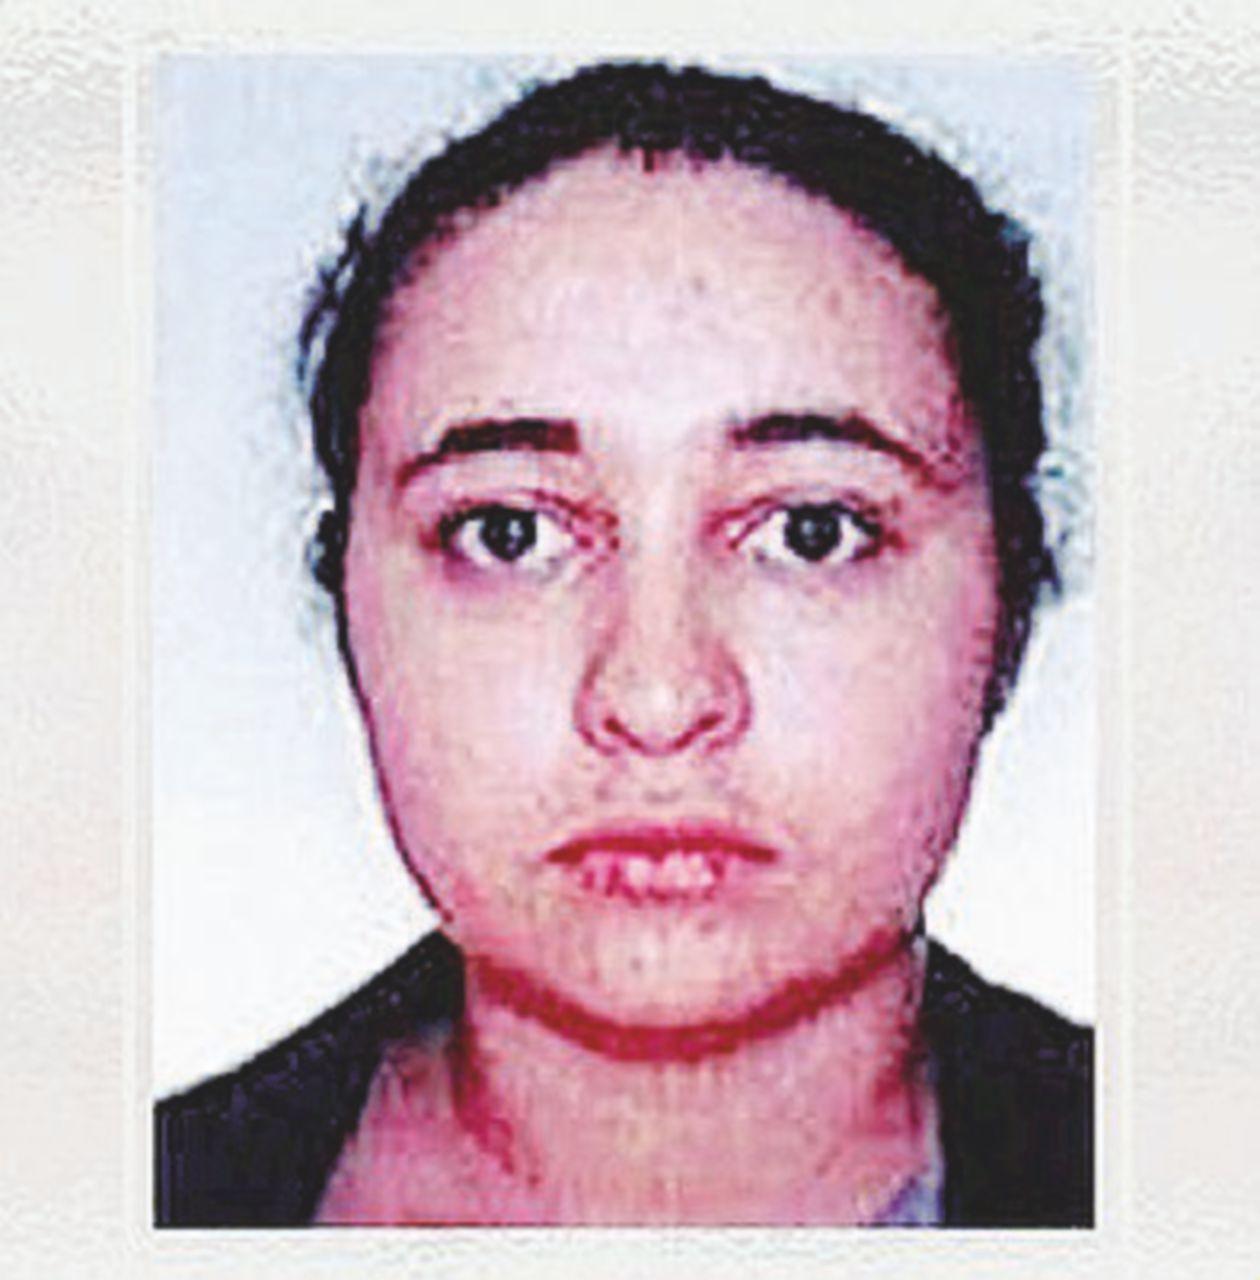 Il commando di Inés: le ragazze del jihad francese fanno paura